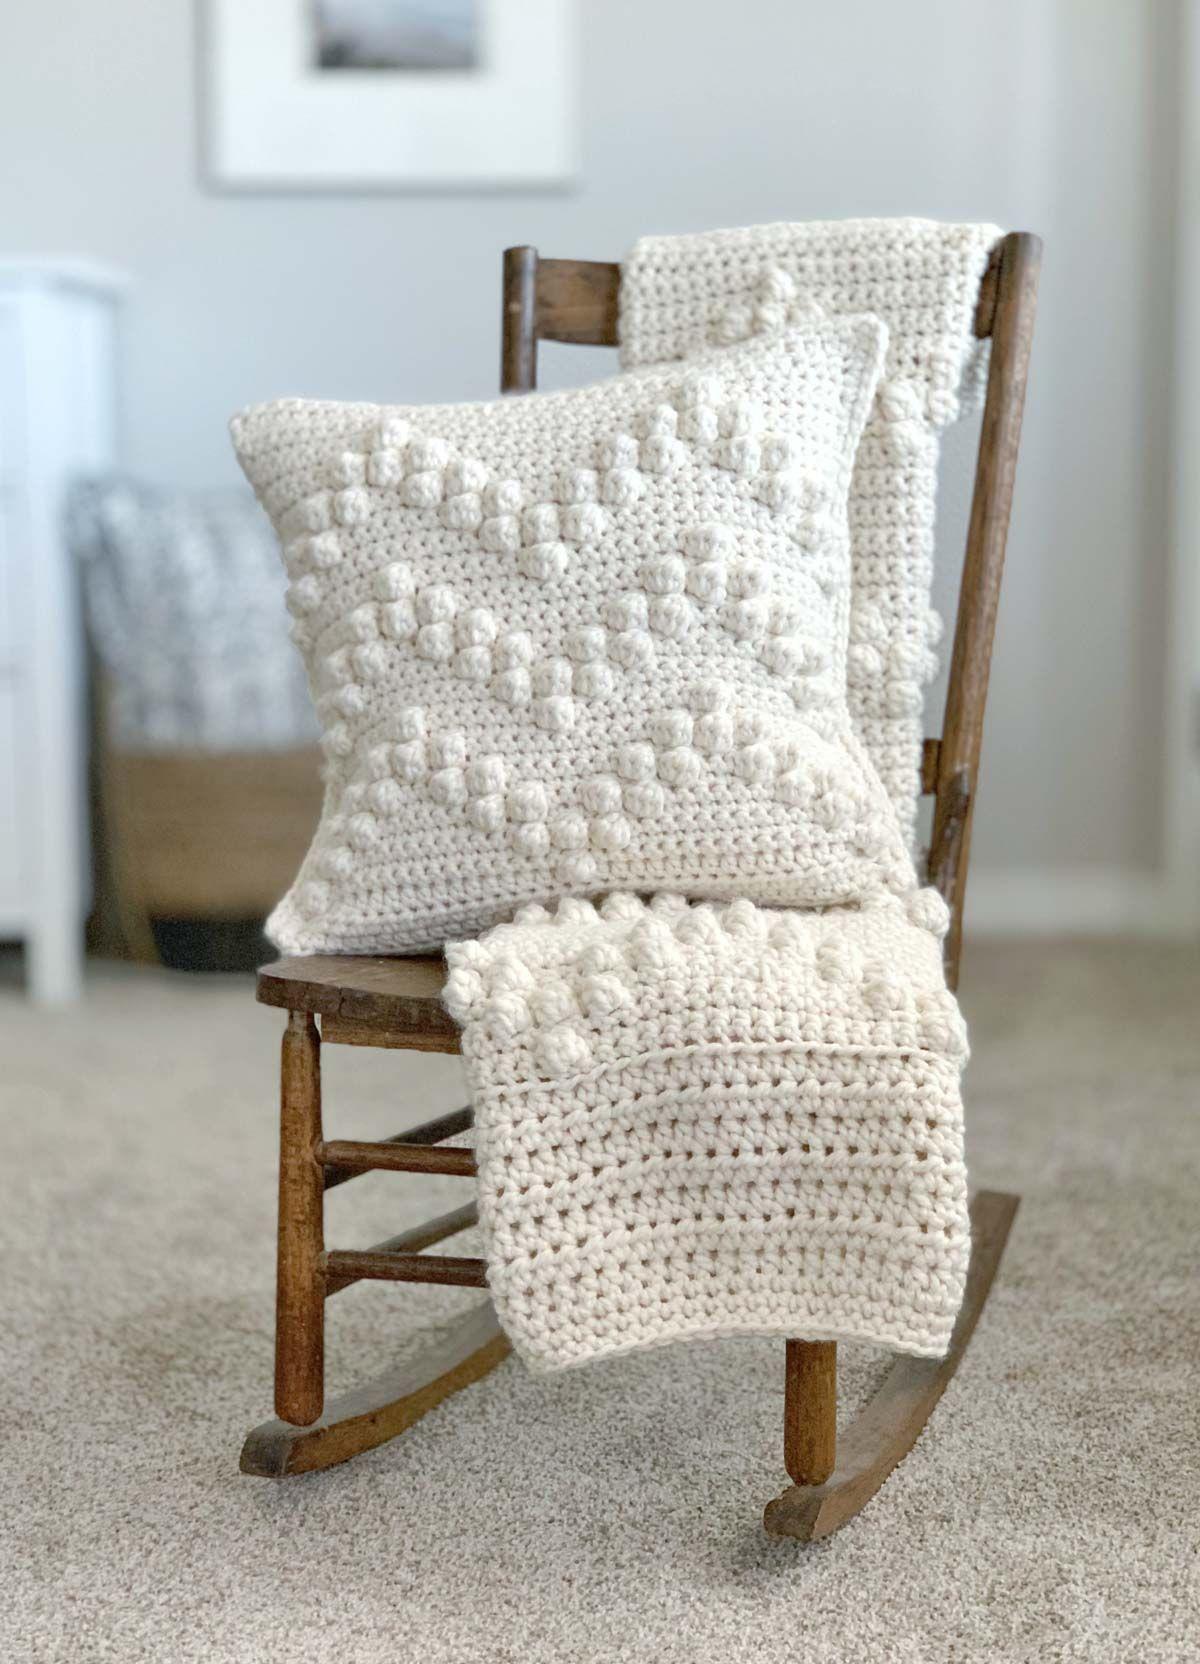 Free Crochet Bobble Stitch Afghan Pattern - perfect modern farmhouse vibes